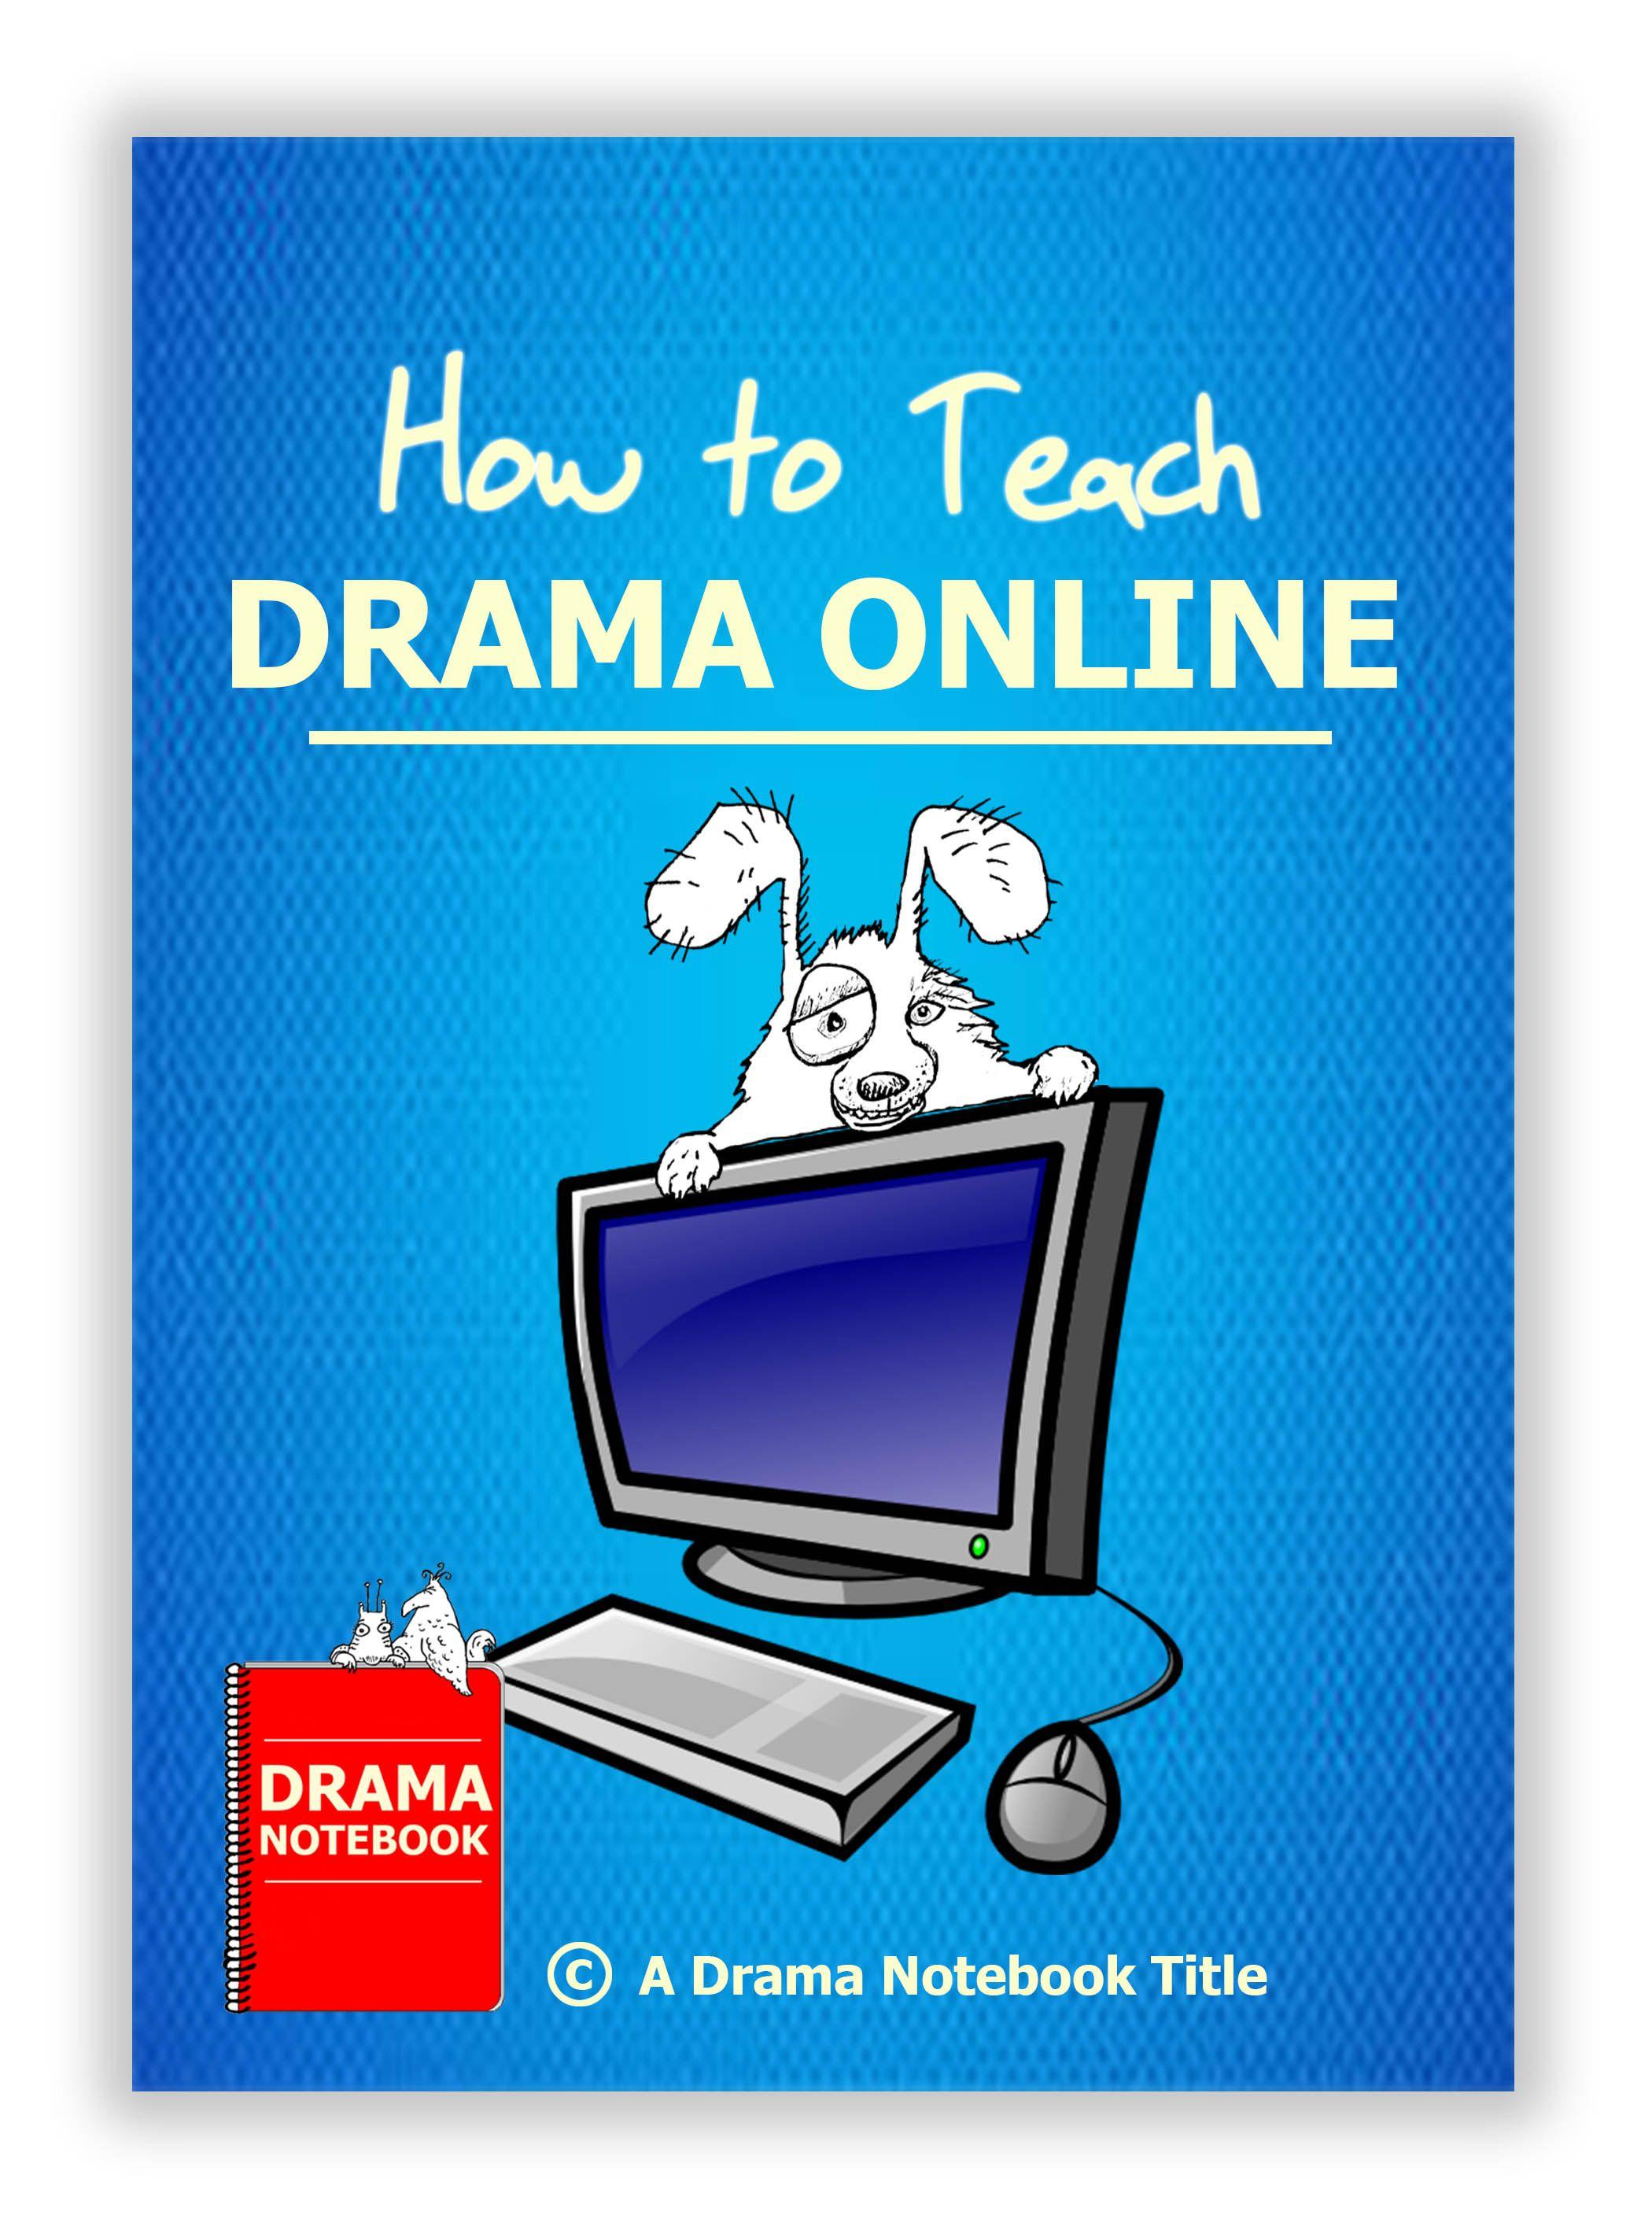 Teach Drama Online in 2020 Dramas online, Teaching drama